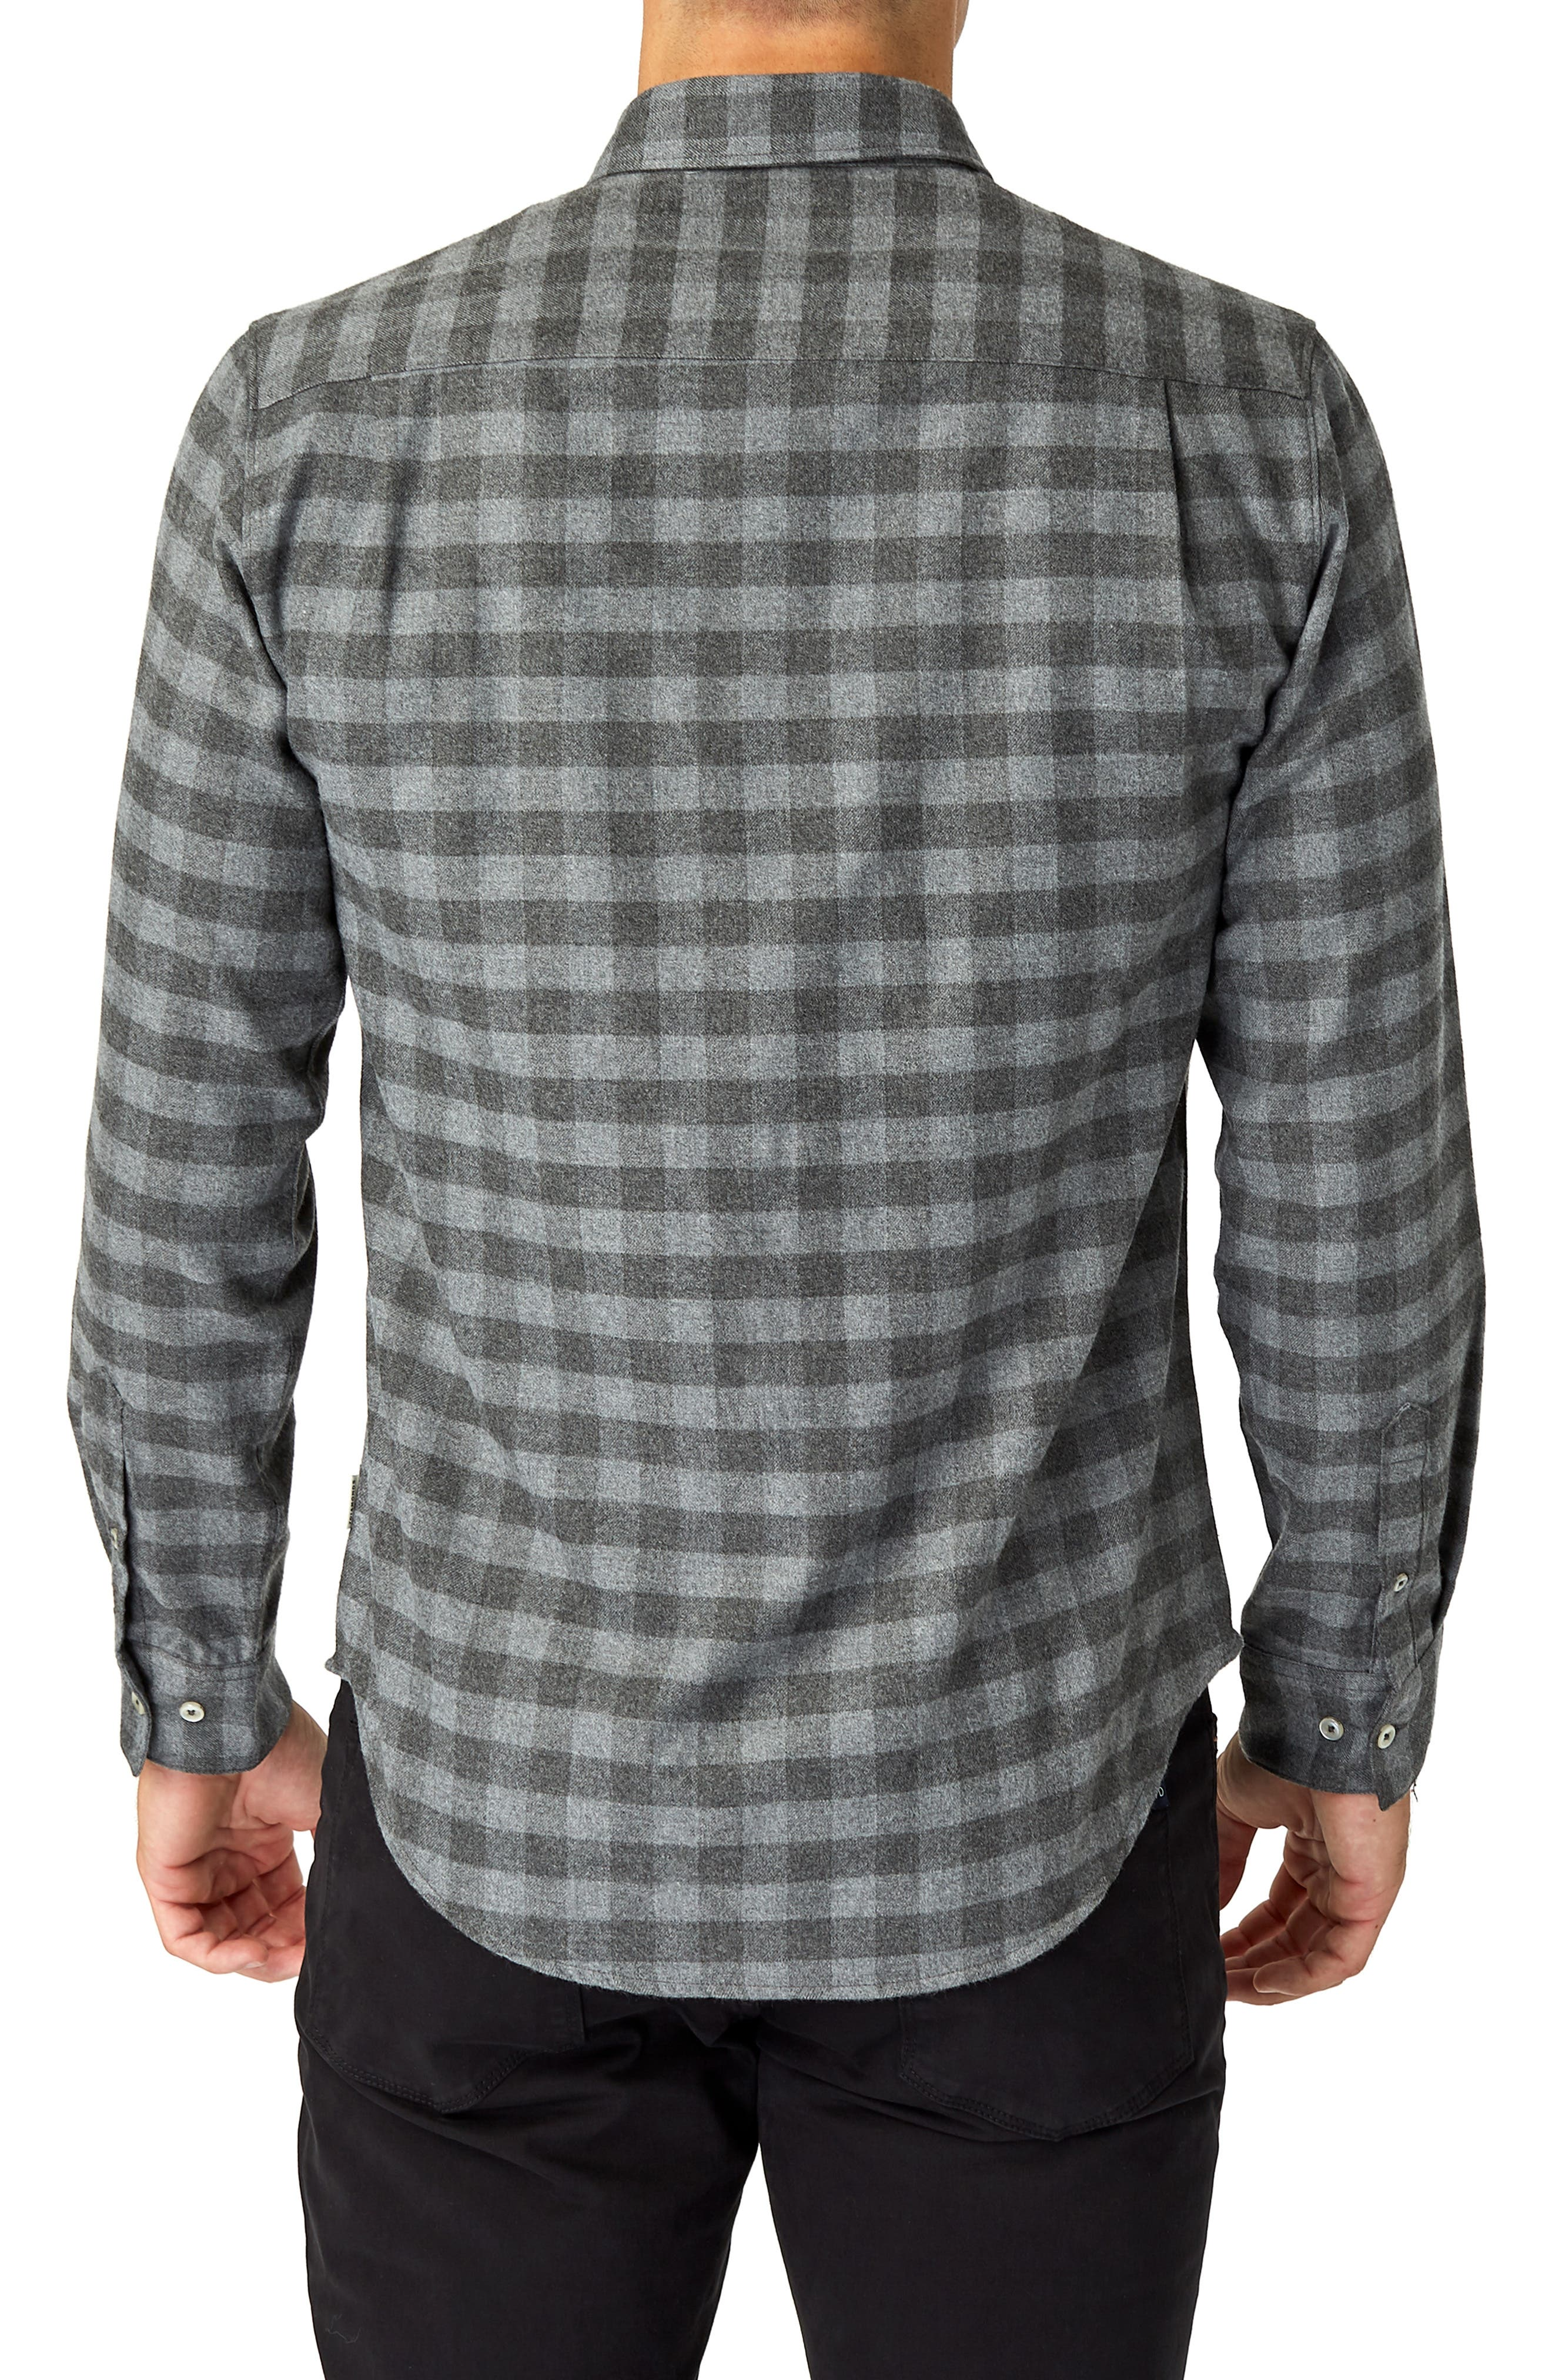 Asher Trim Fit Flannel Shirt,                             Alternate thumbnail 3, color,                             GREY